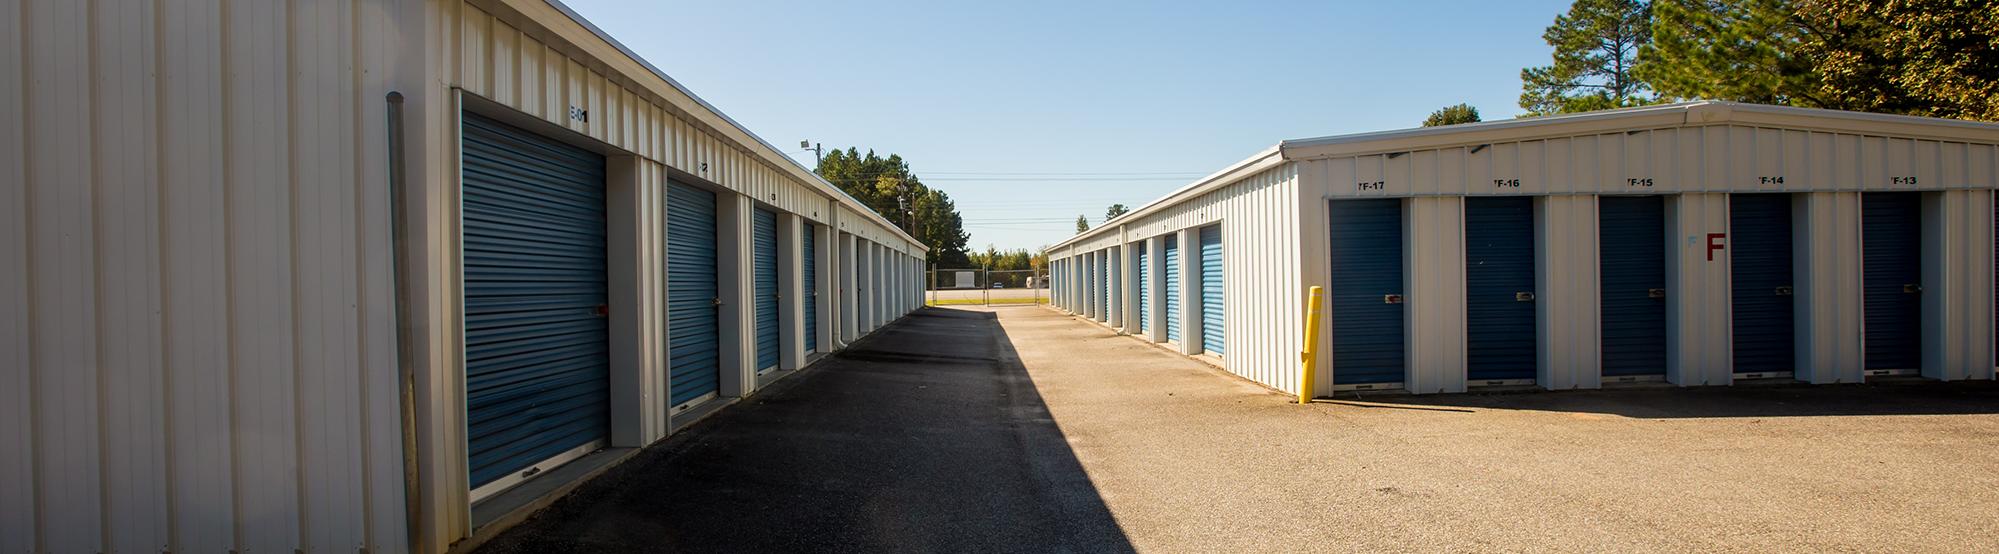 Drive Up Access Self Storage in Hartsville SC